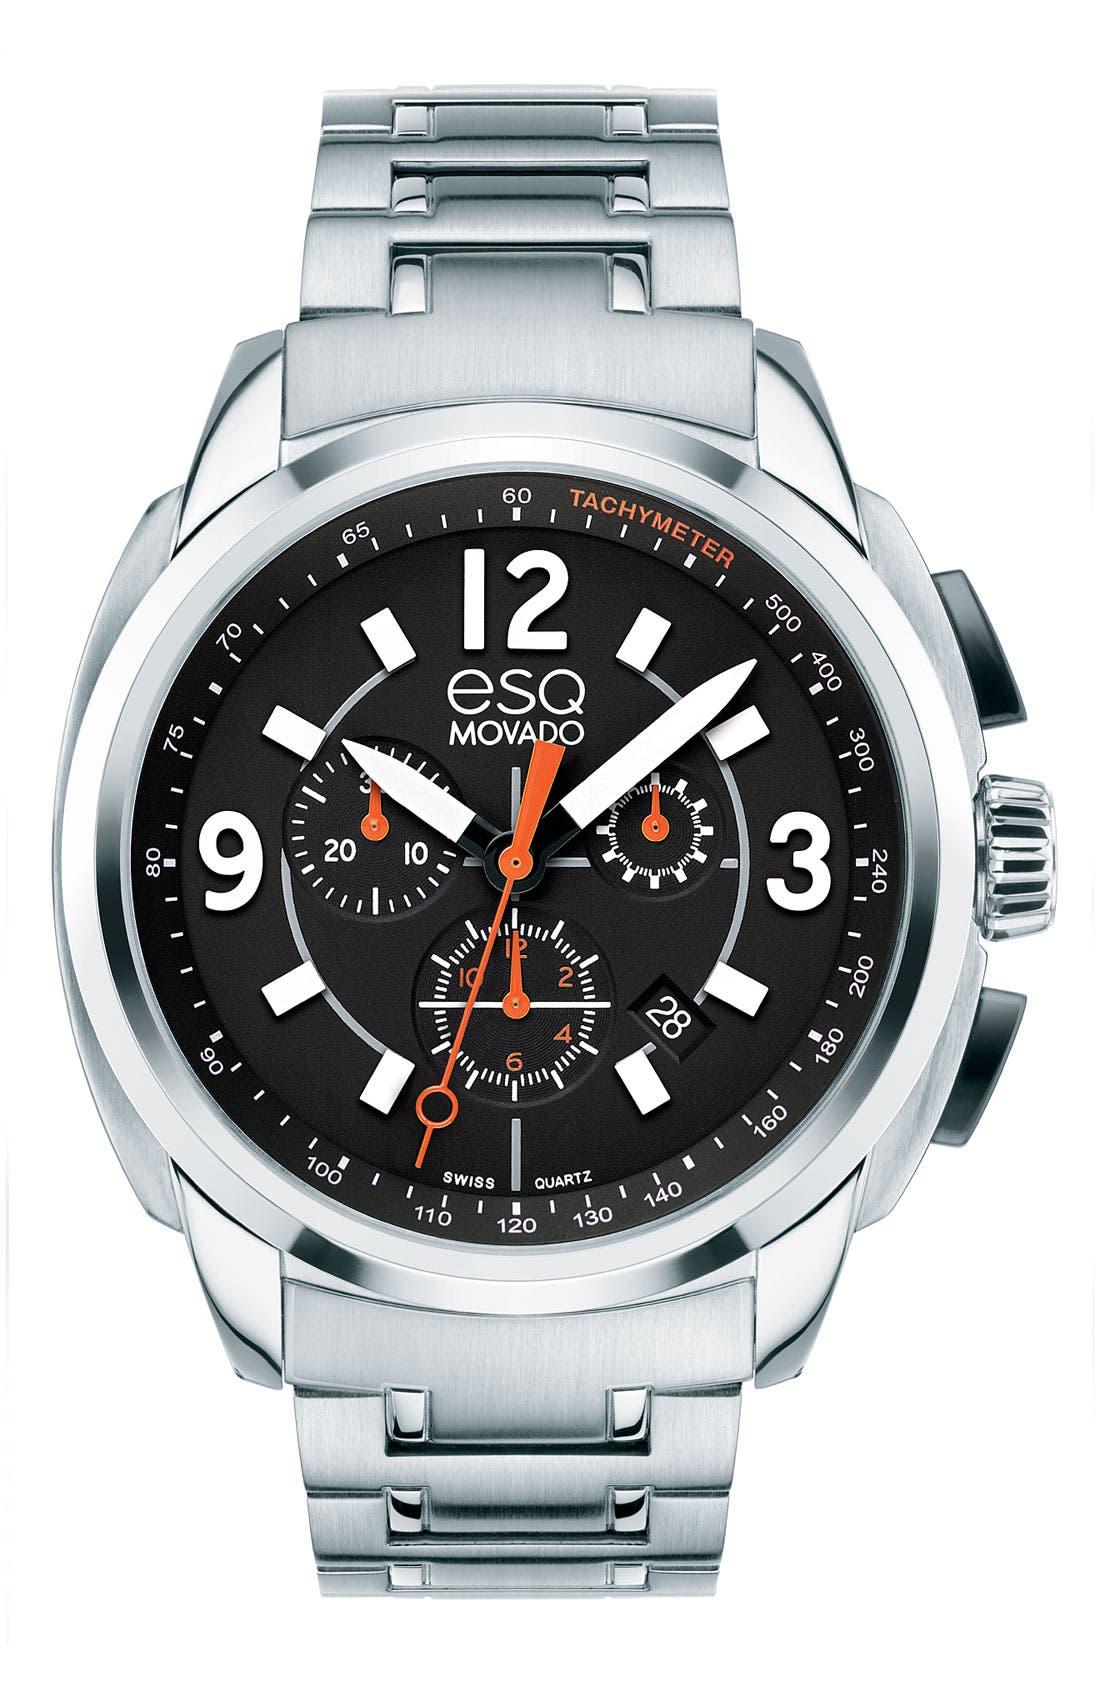 Main Image - ESQ Movado 'Excel' Chronograph Bracelet Watch